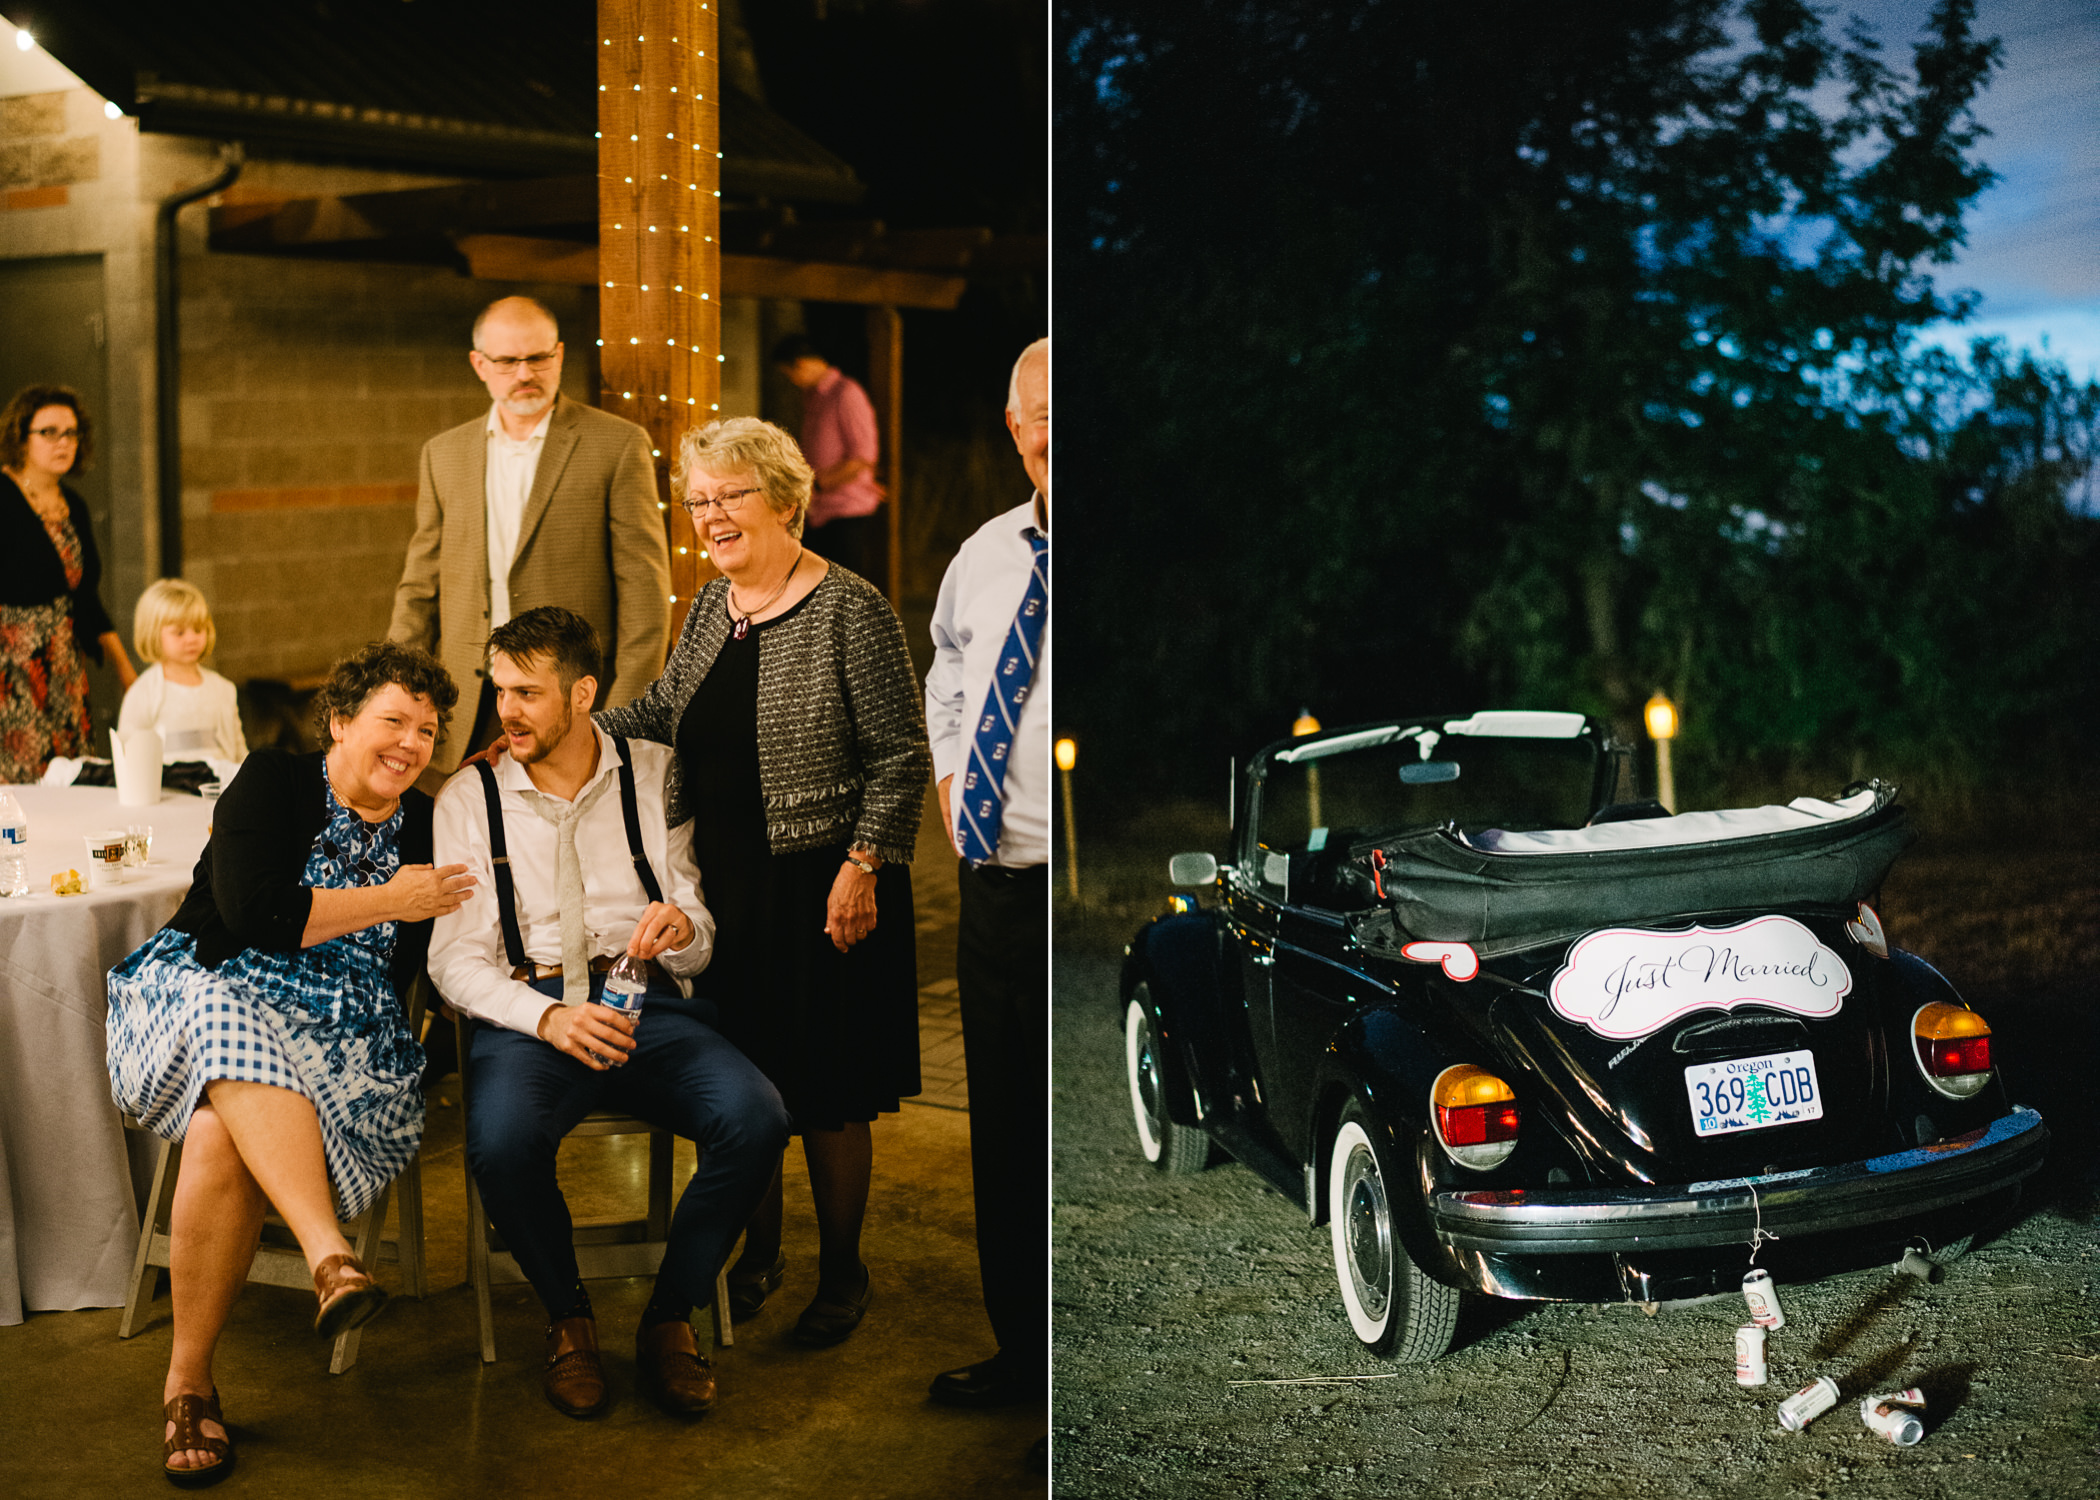 mt-pisgah-oregon-september-wedding-138a.jpg